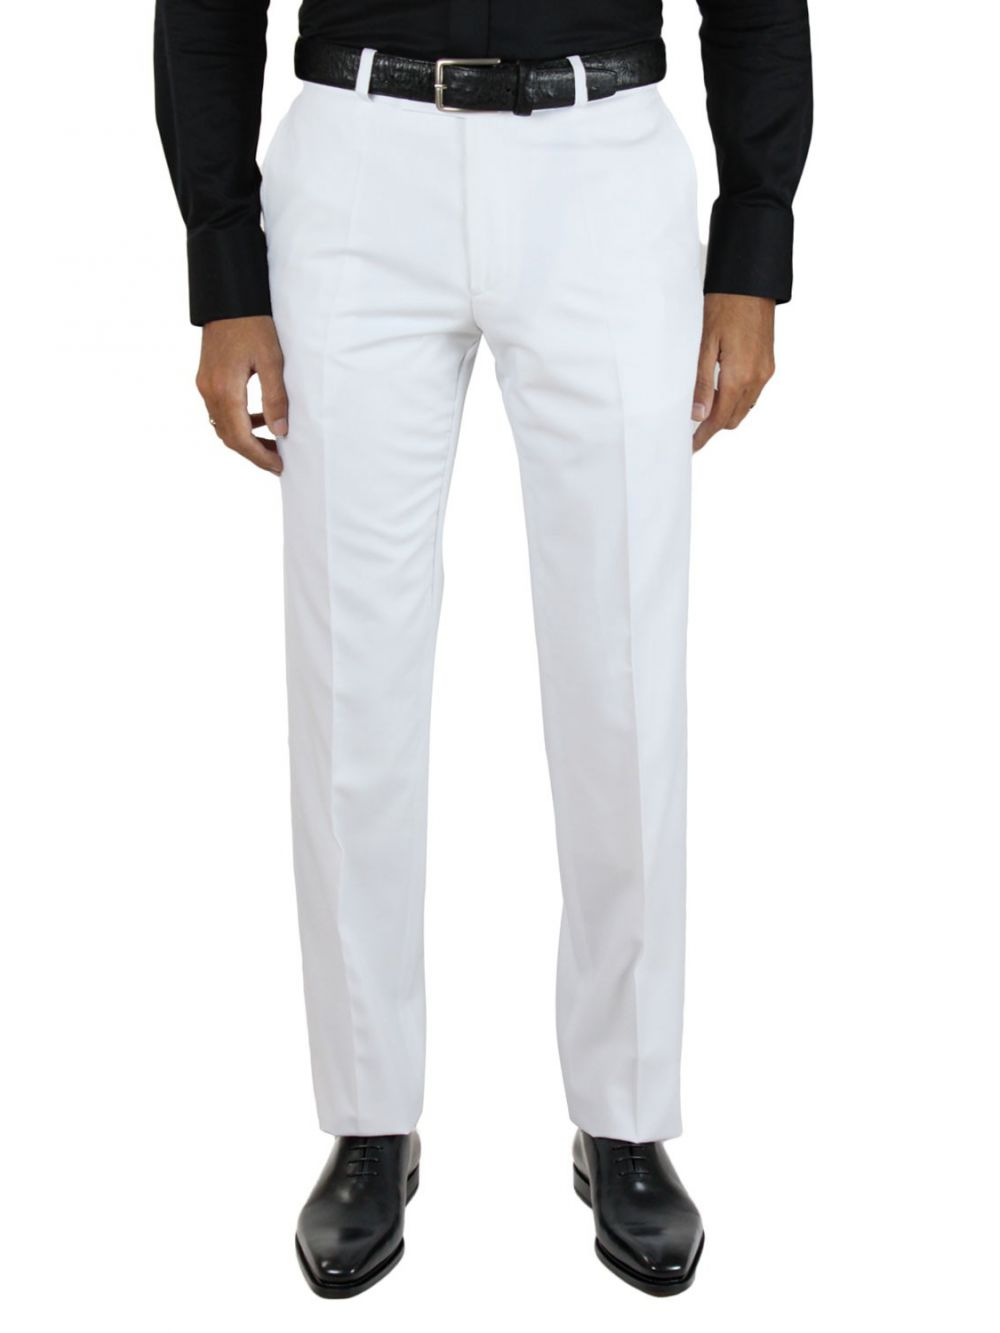 Pantalon blanc pas cher kebello com - Pantalon peintre blanc pas cher ...